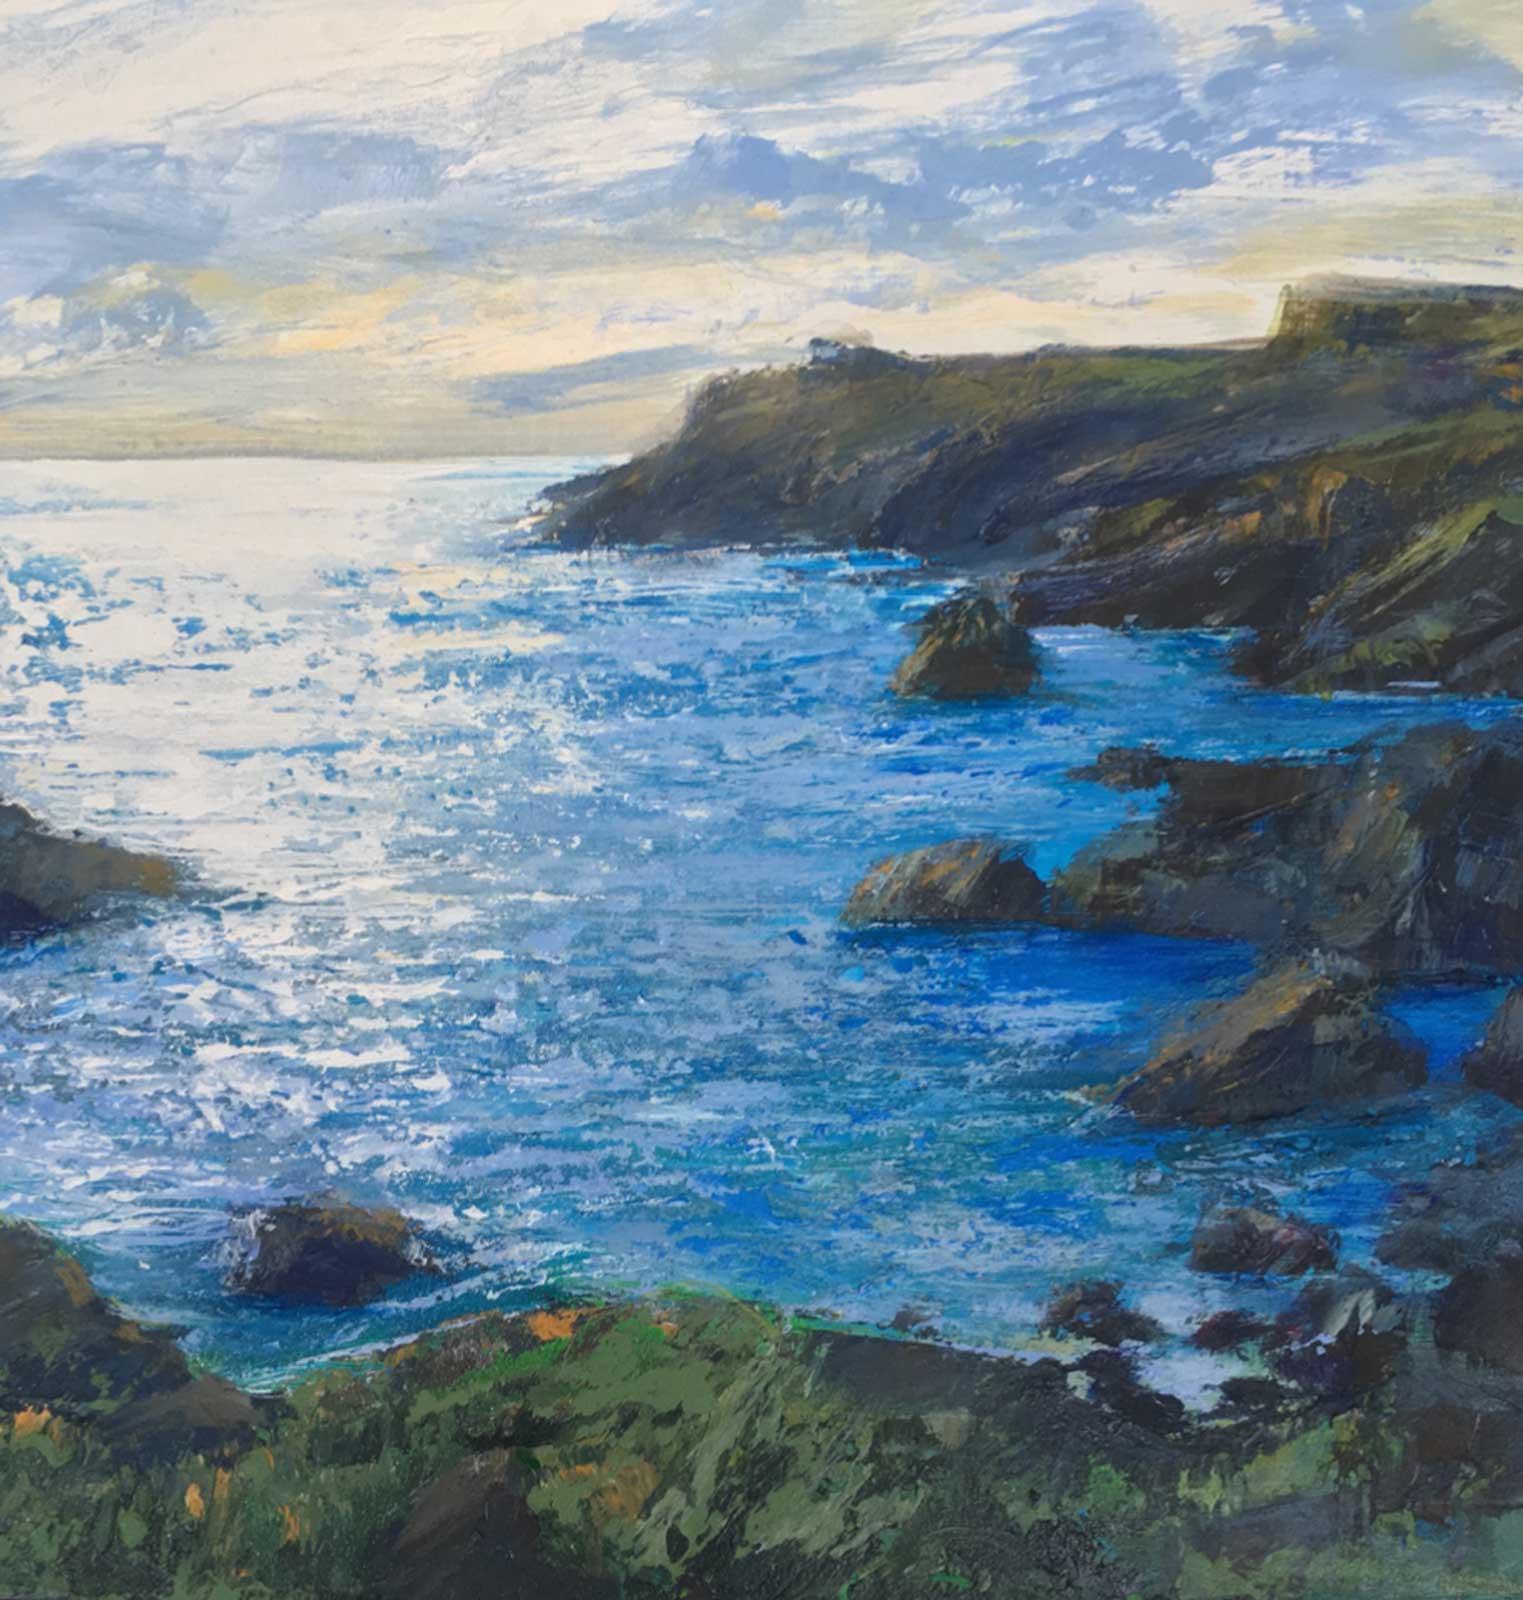 Into the Bay, Kynance